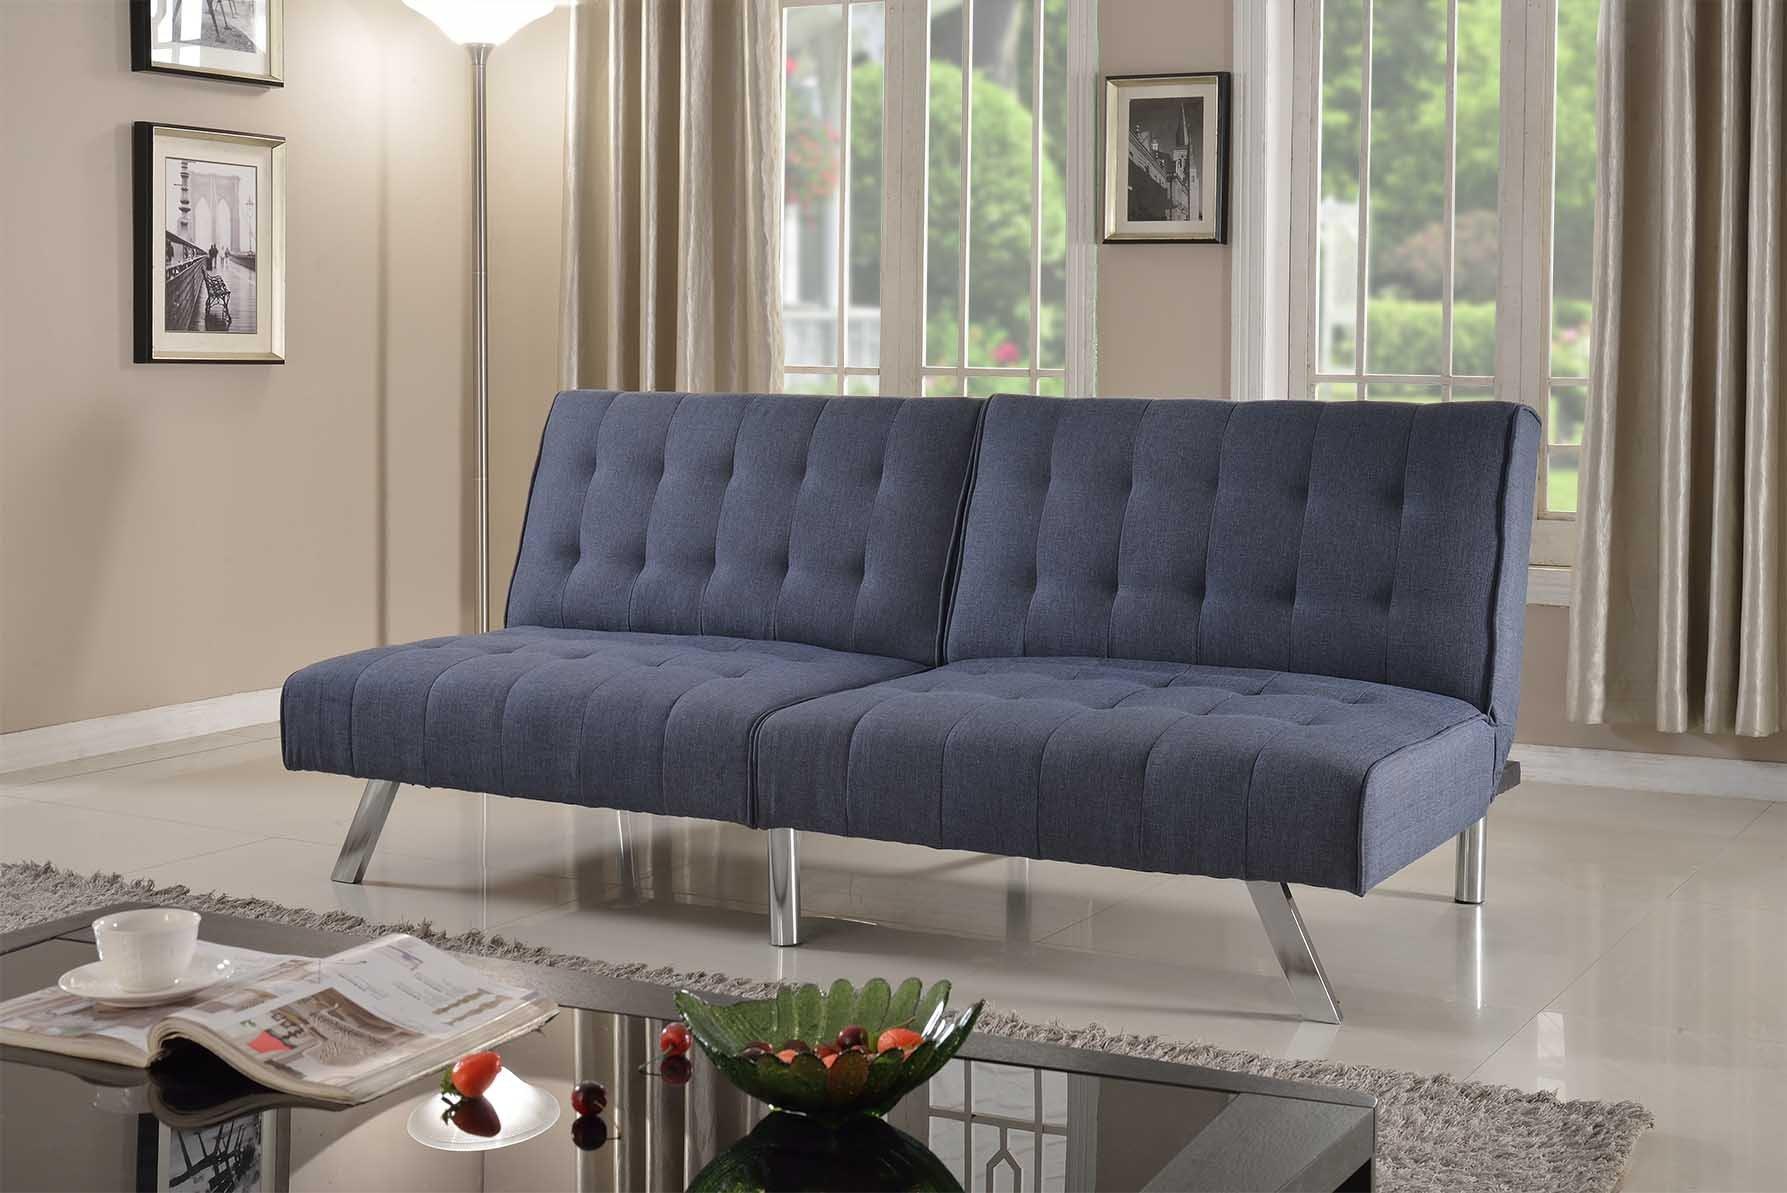 Home Life Linen With Split Back Adjule Klik Klak Sofa Futon Bed Sleeper Convertible Quality